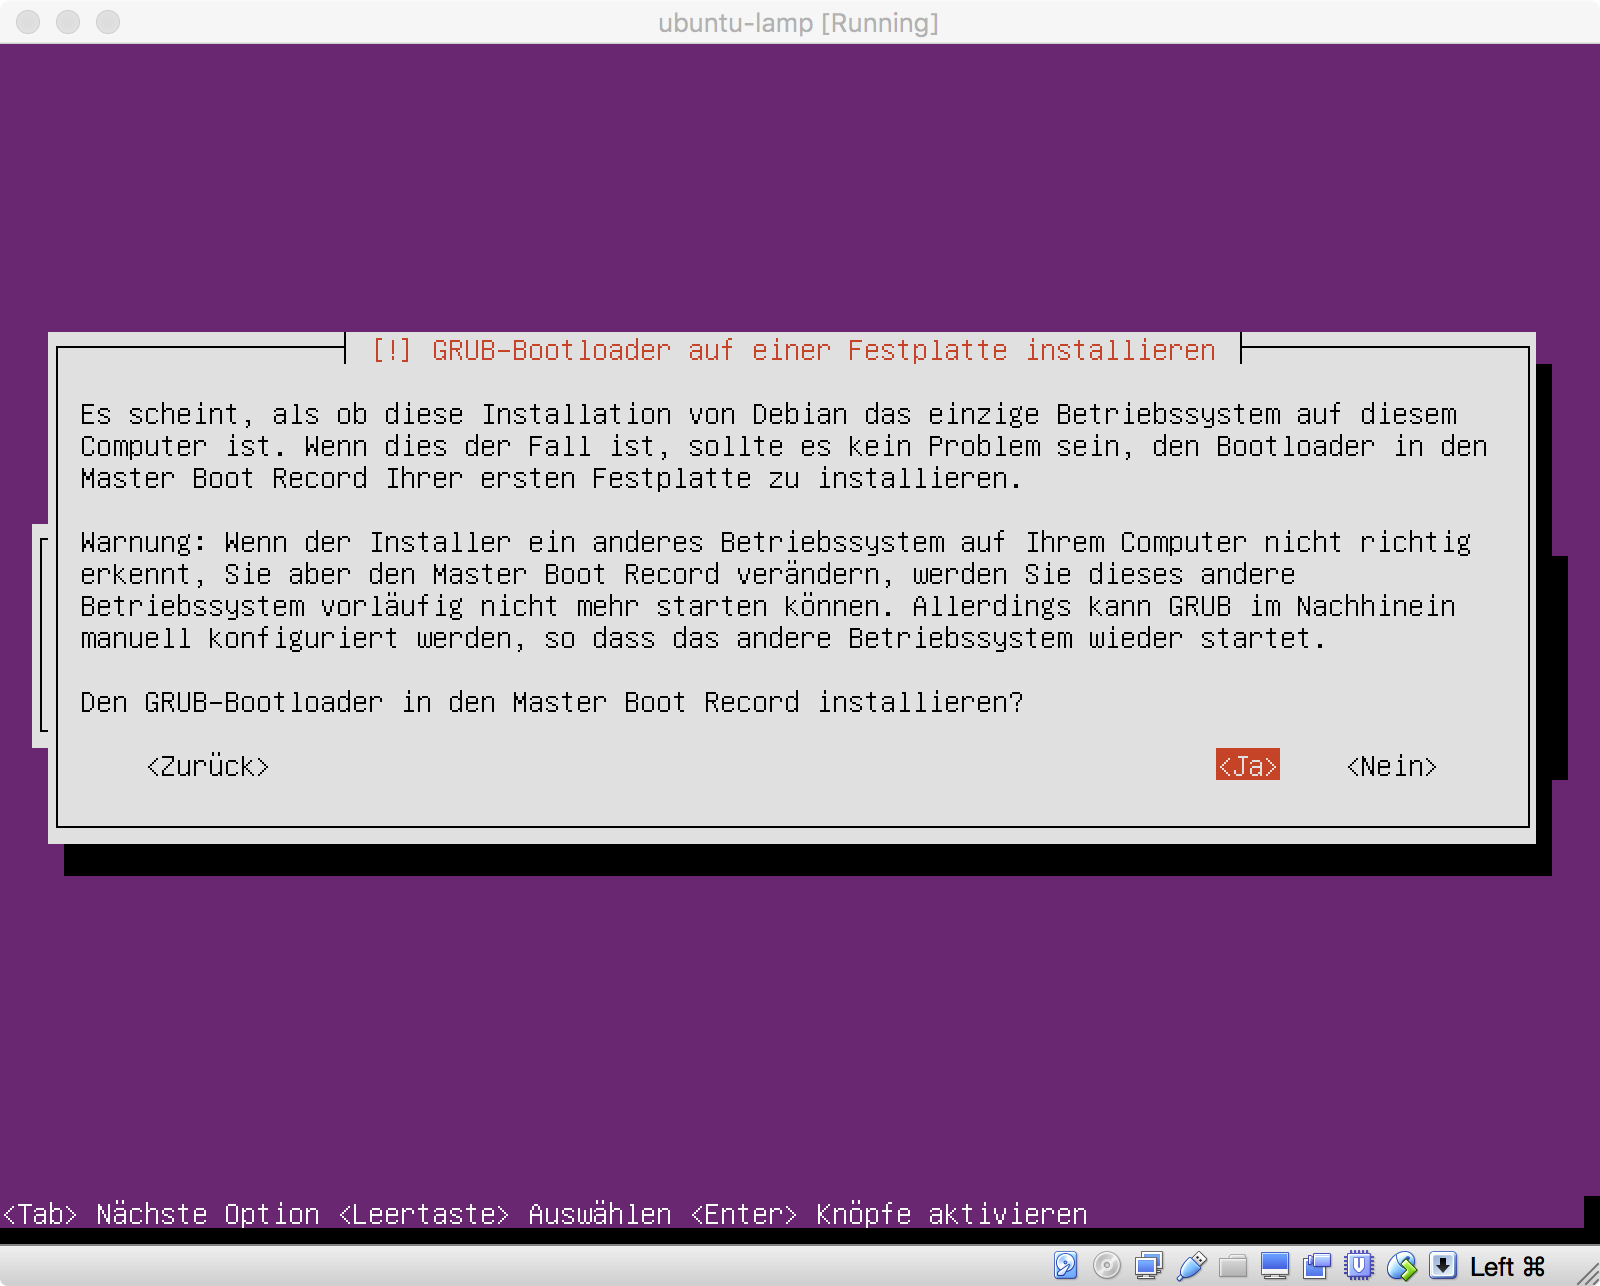 Ubuntu Installation - GRUB Bootloader